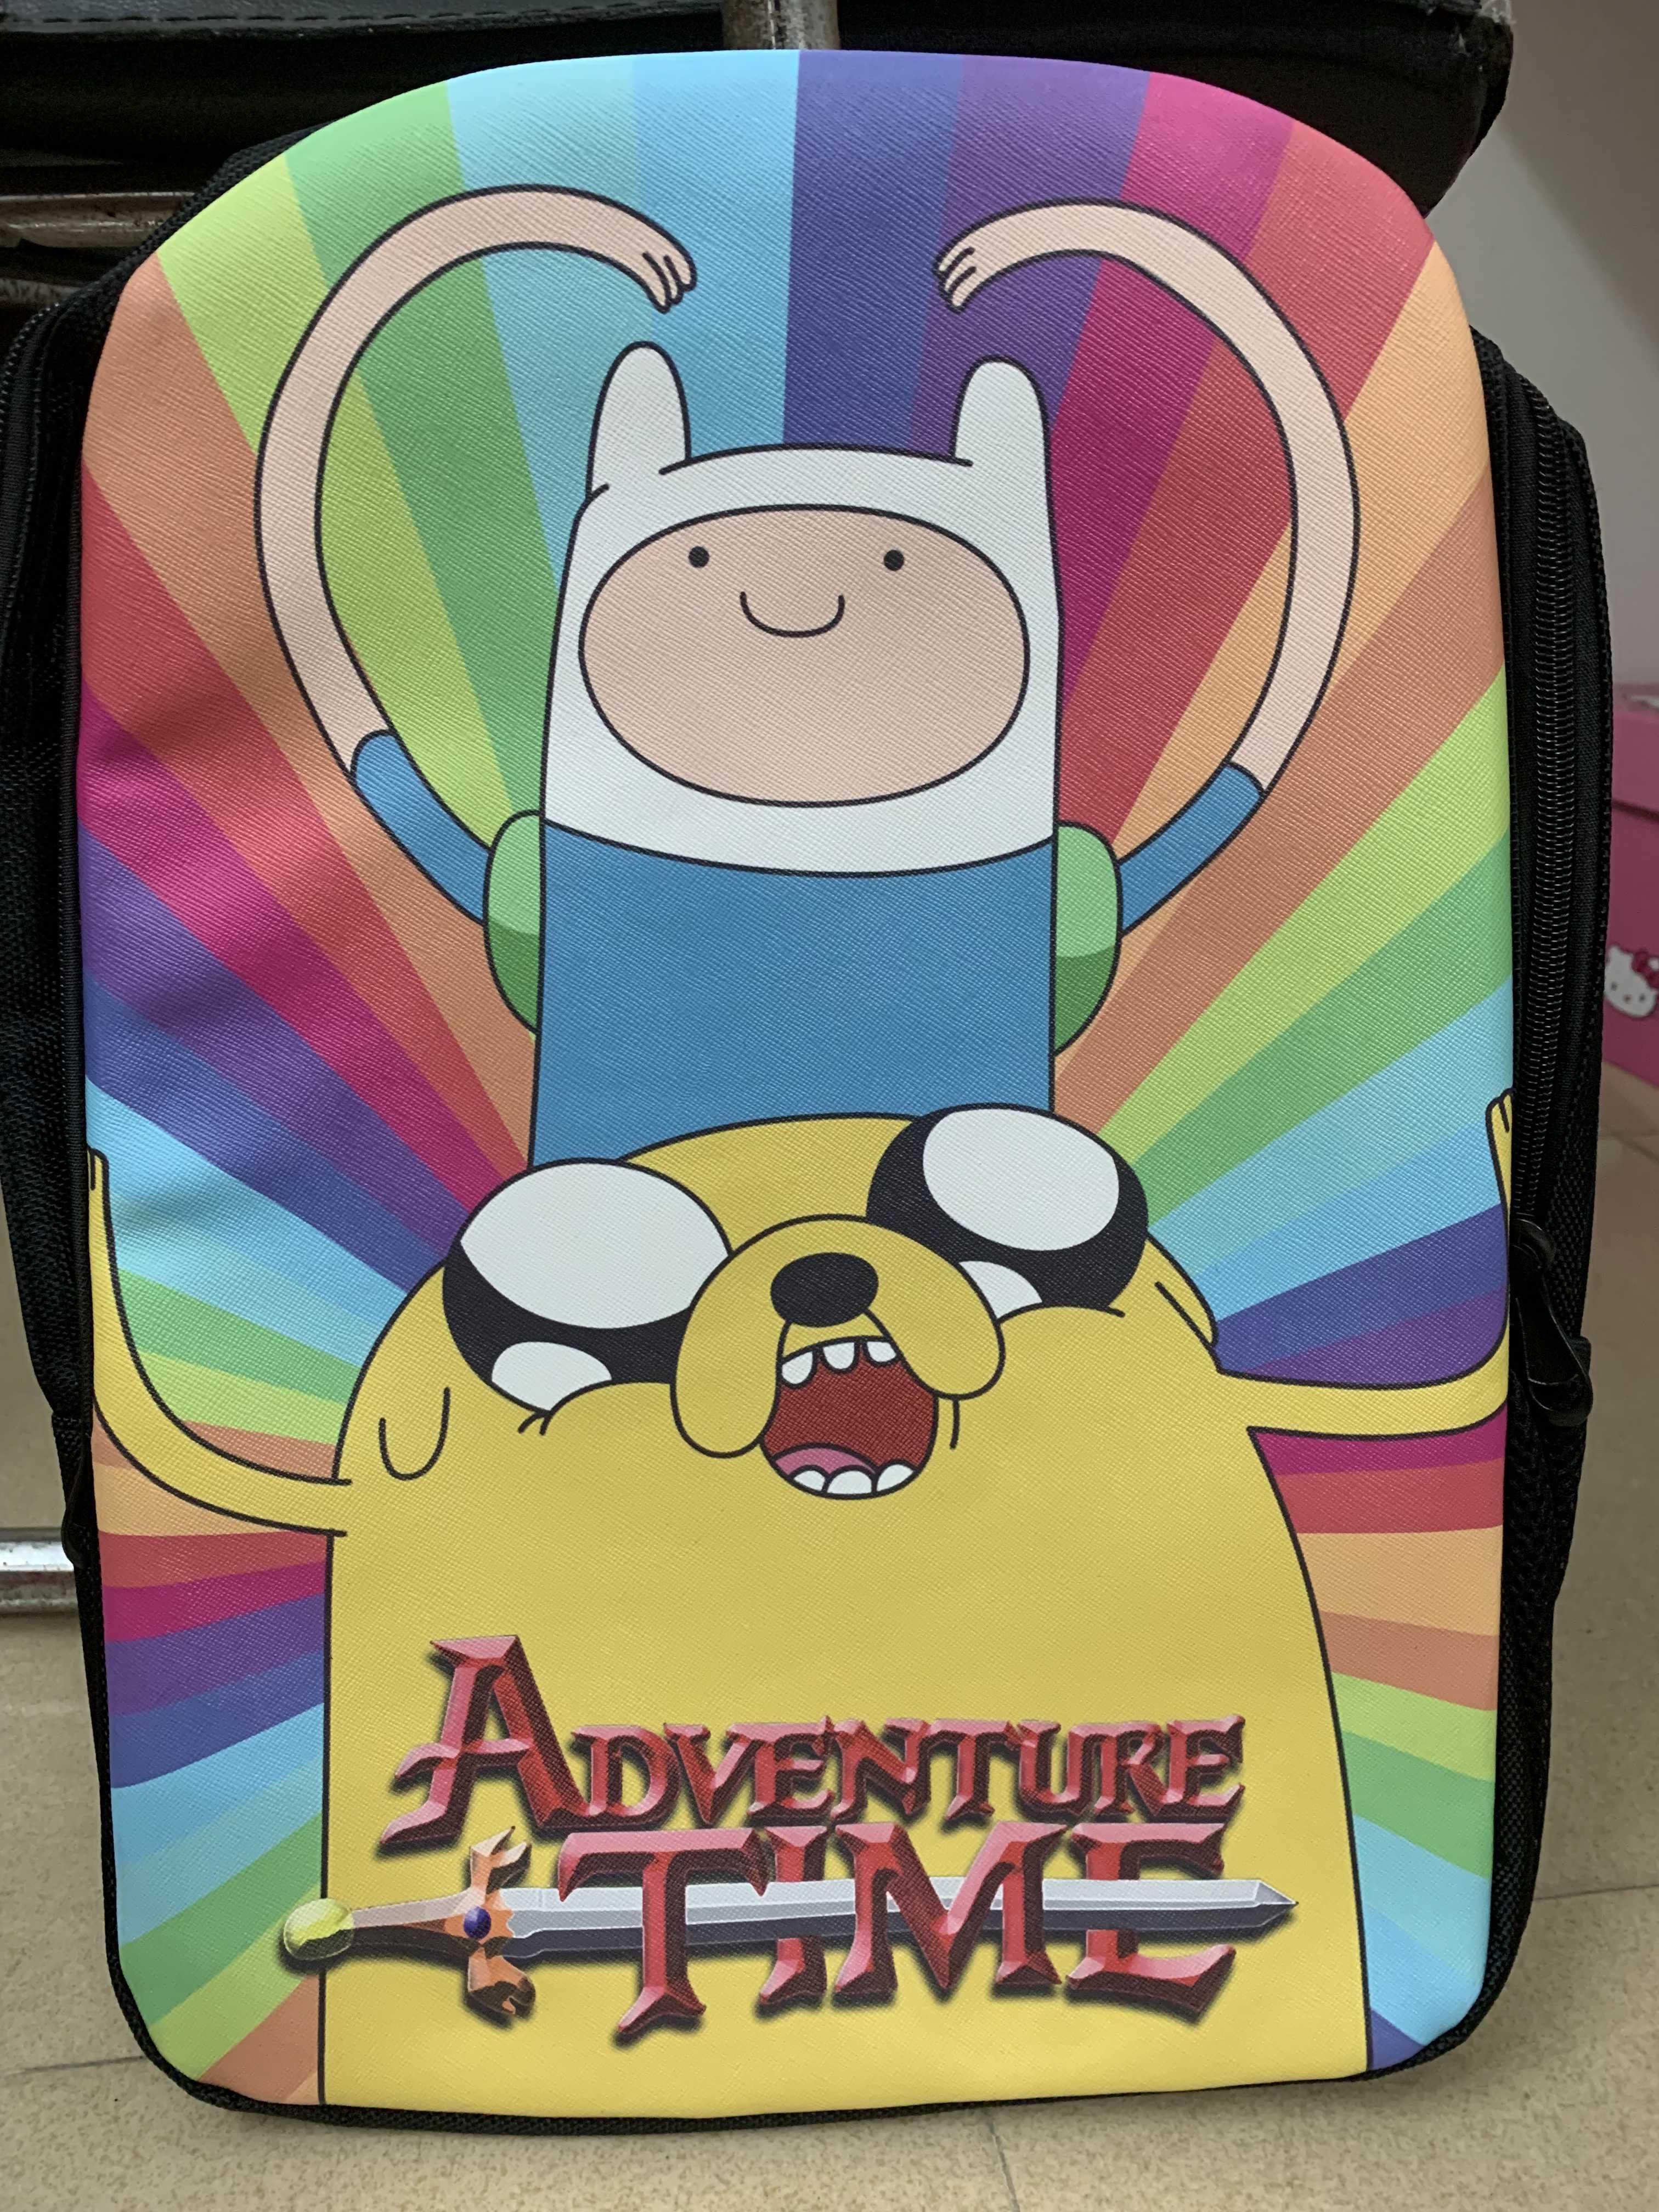 Clearance Sale Adventure Time Backpack bmo finn jake School Bags shoulder bag Laptop travel bag rucksack